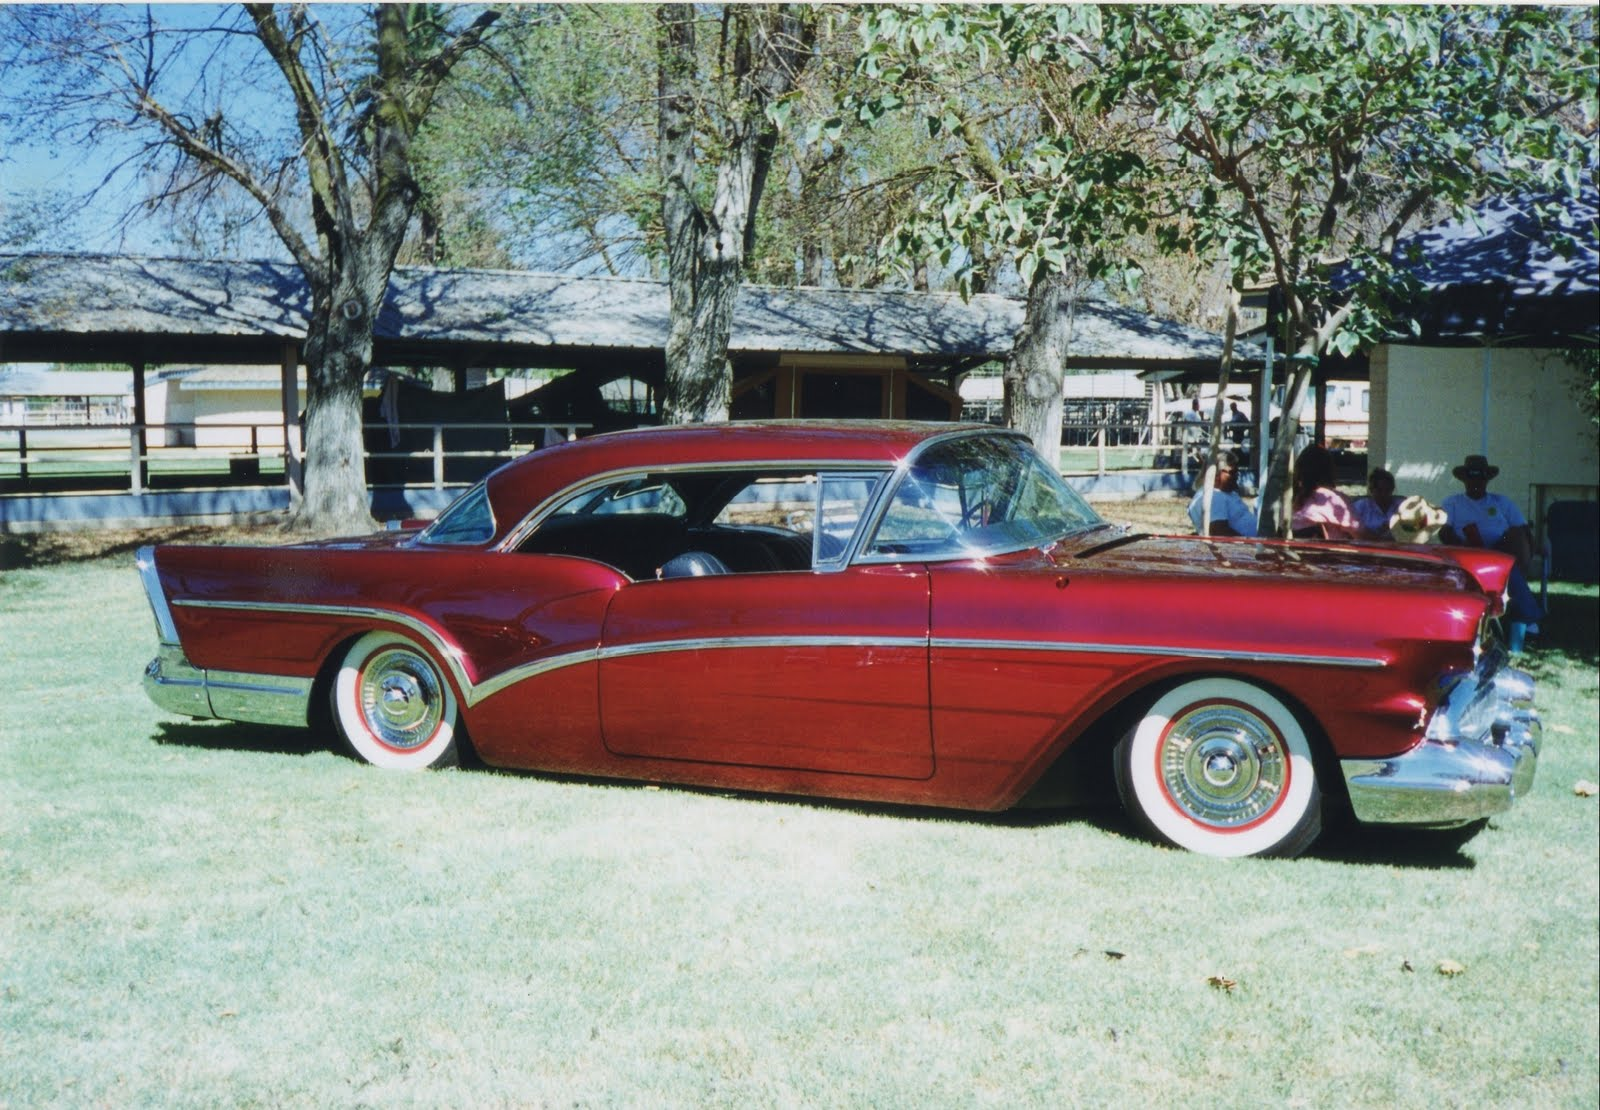 1957 Buick Parts For Sale http://stylishkustoms.blogspot.com/2010/04